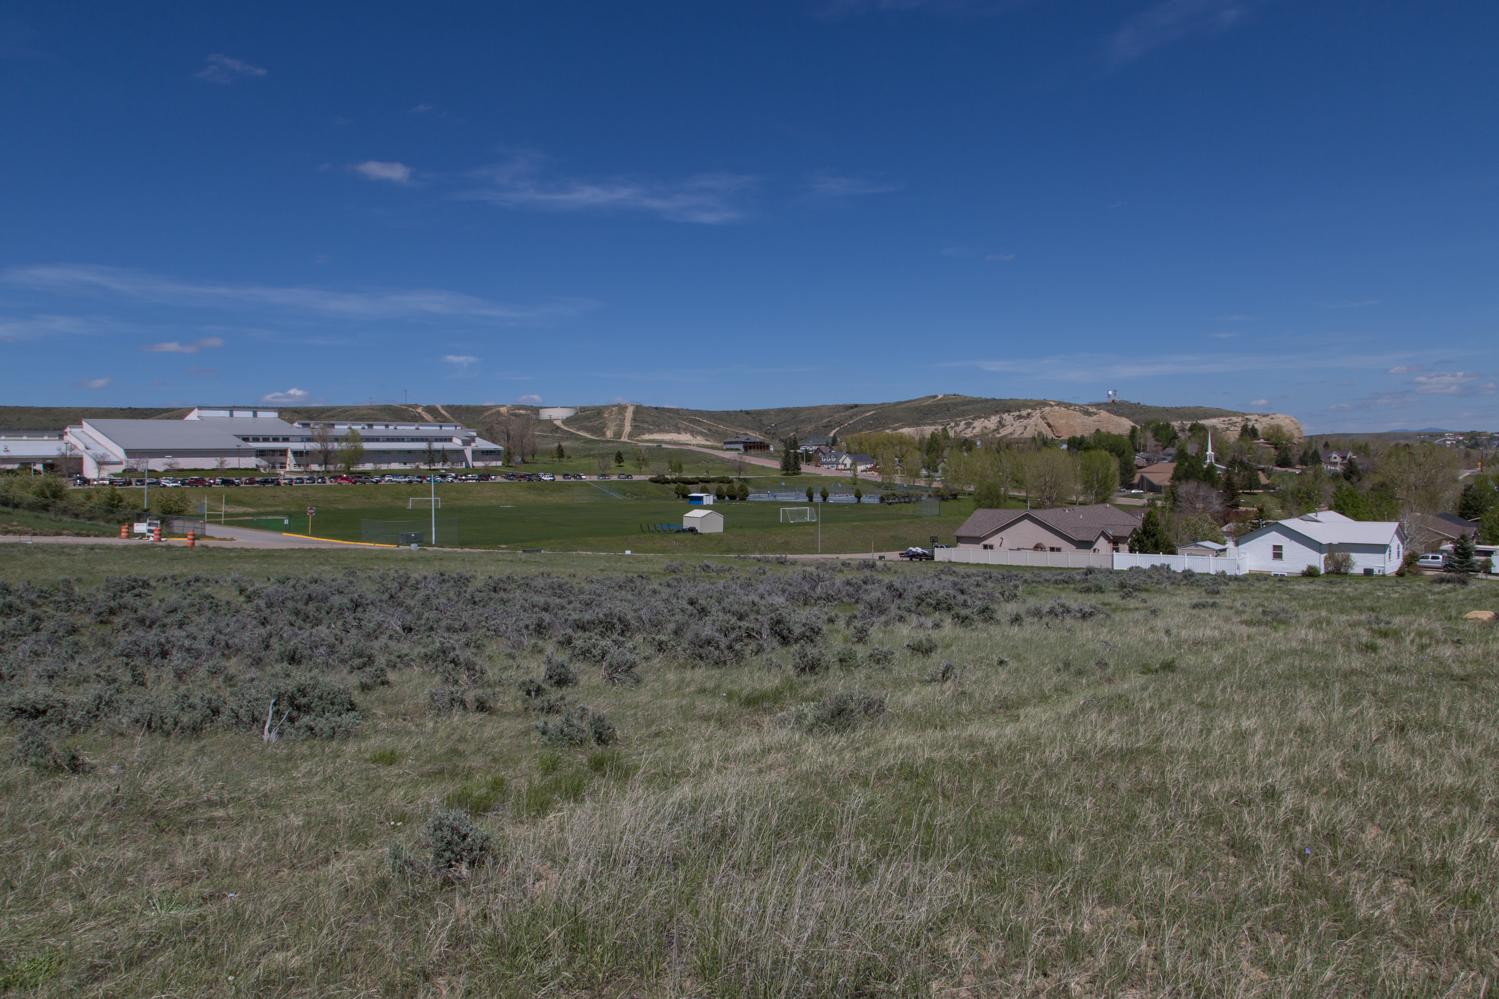 Moffat County High School, Aerial, housing development, Craig, CO, land development for sale, 23-acres, 90 home sites